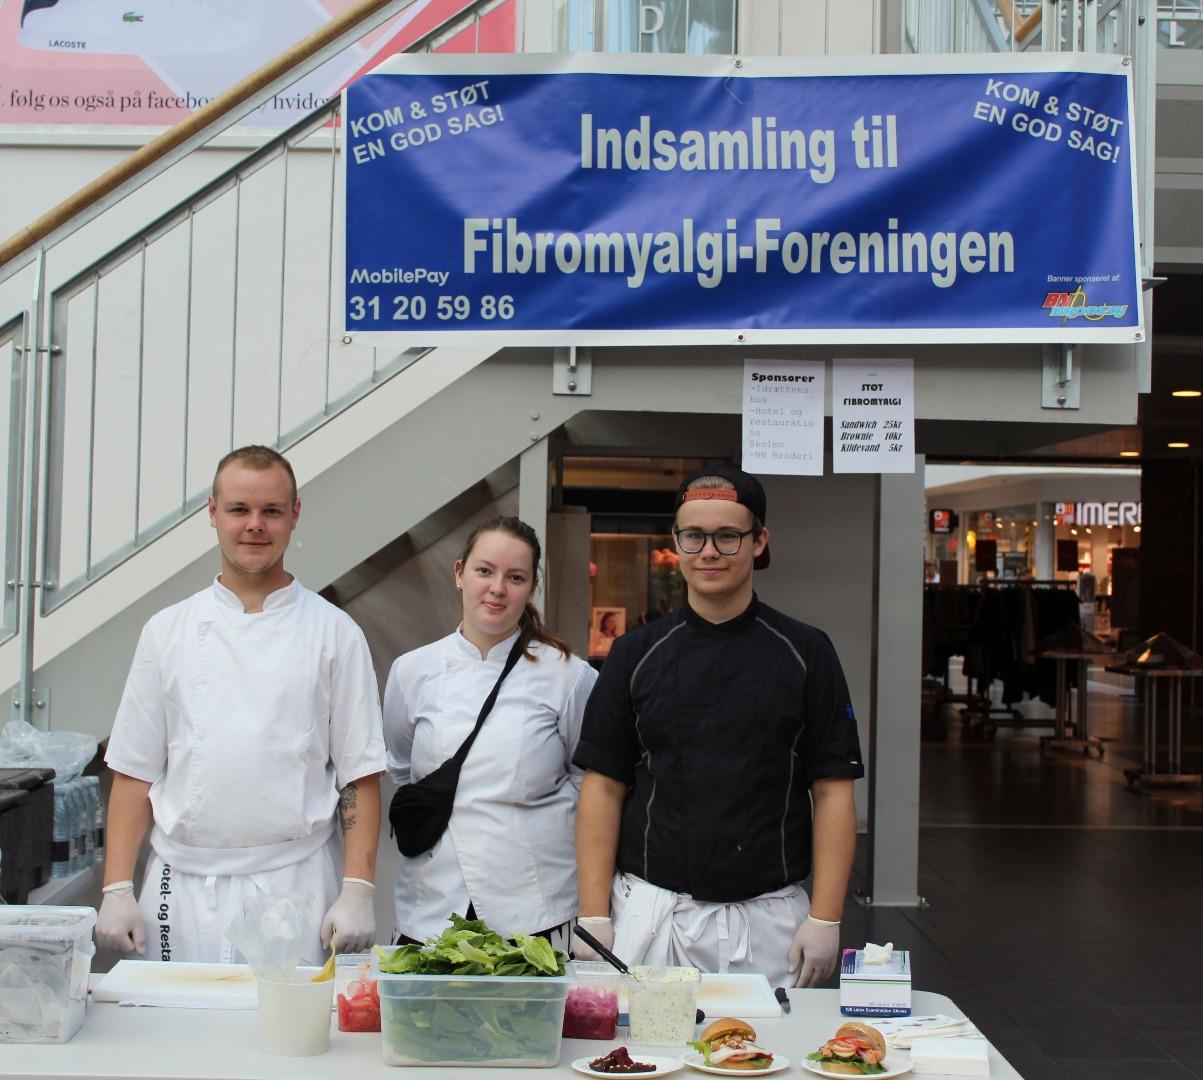 Mad-event i fibromyalgiens navn | Dansk Fibromyalgi-Forening